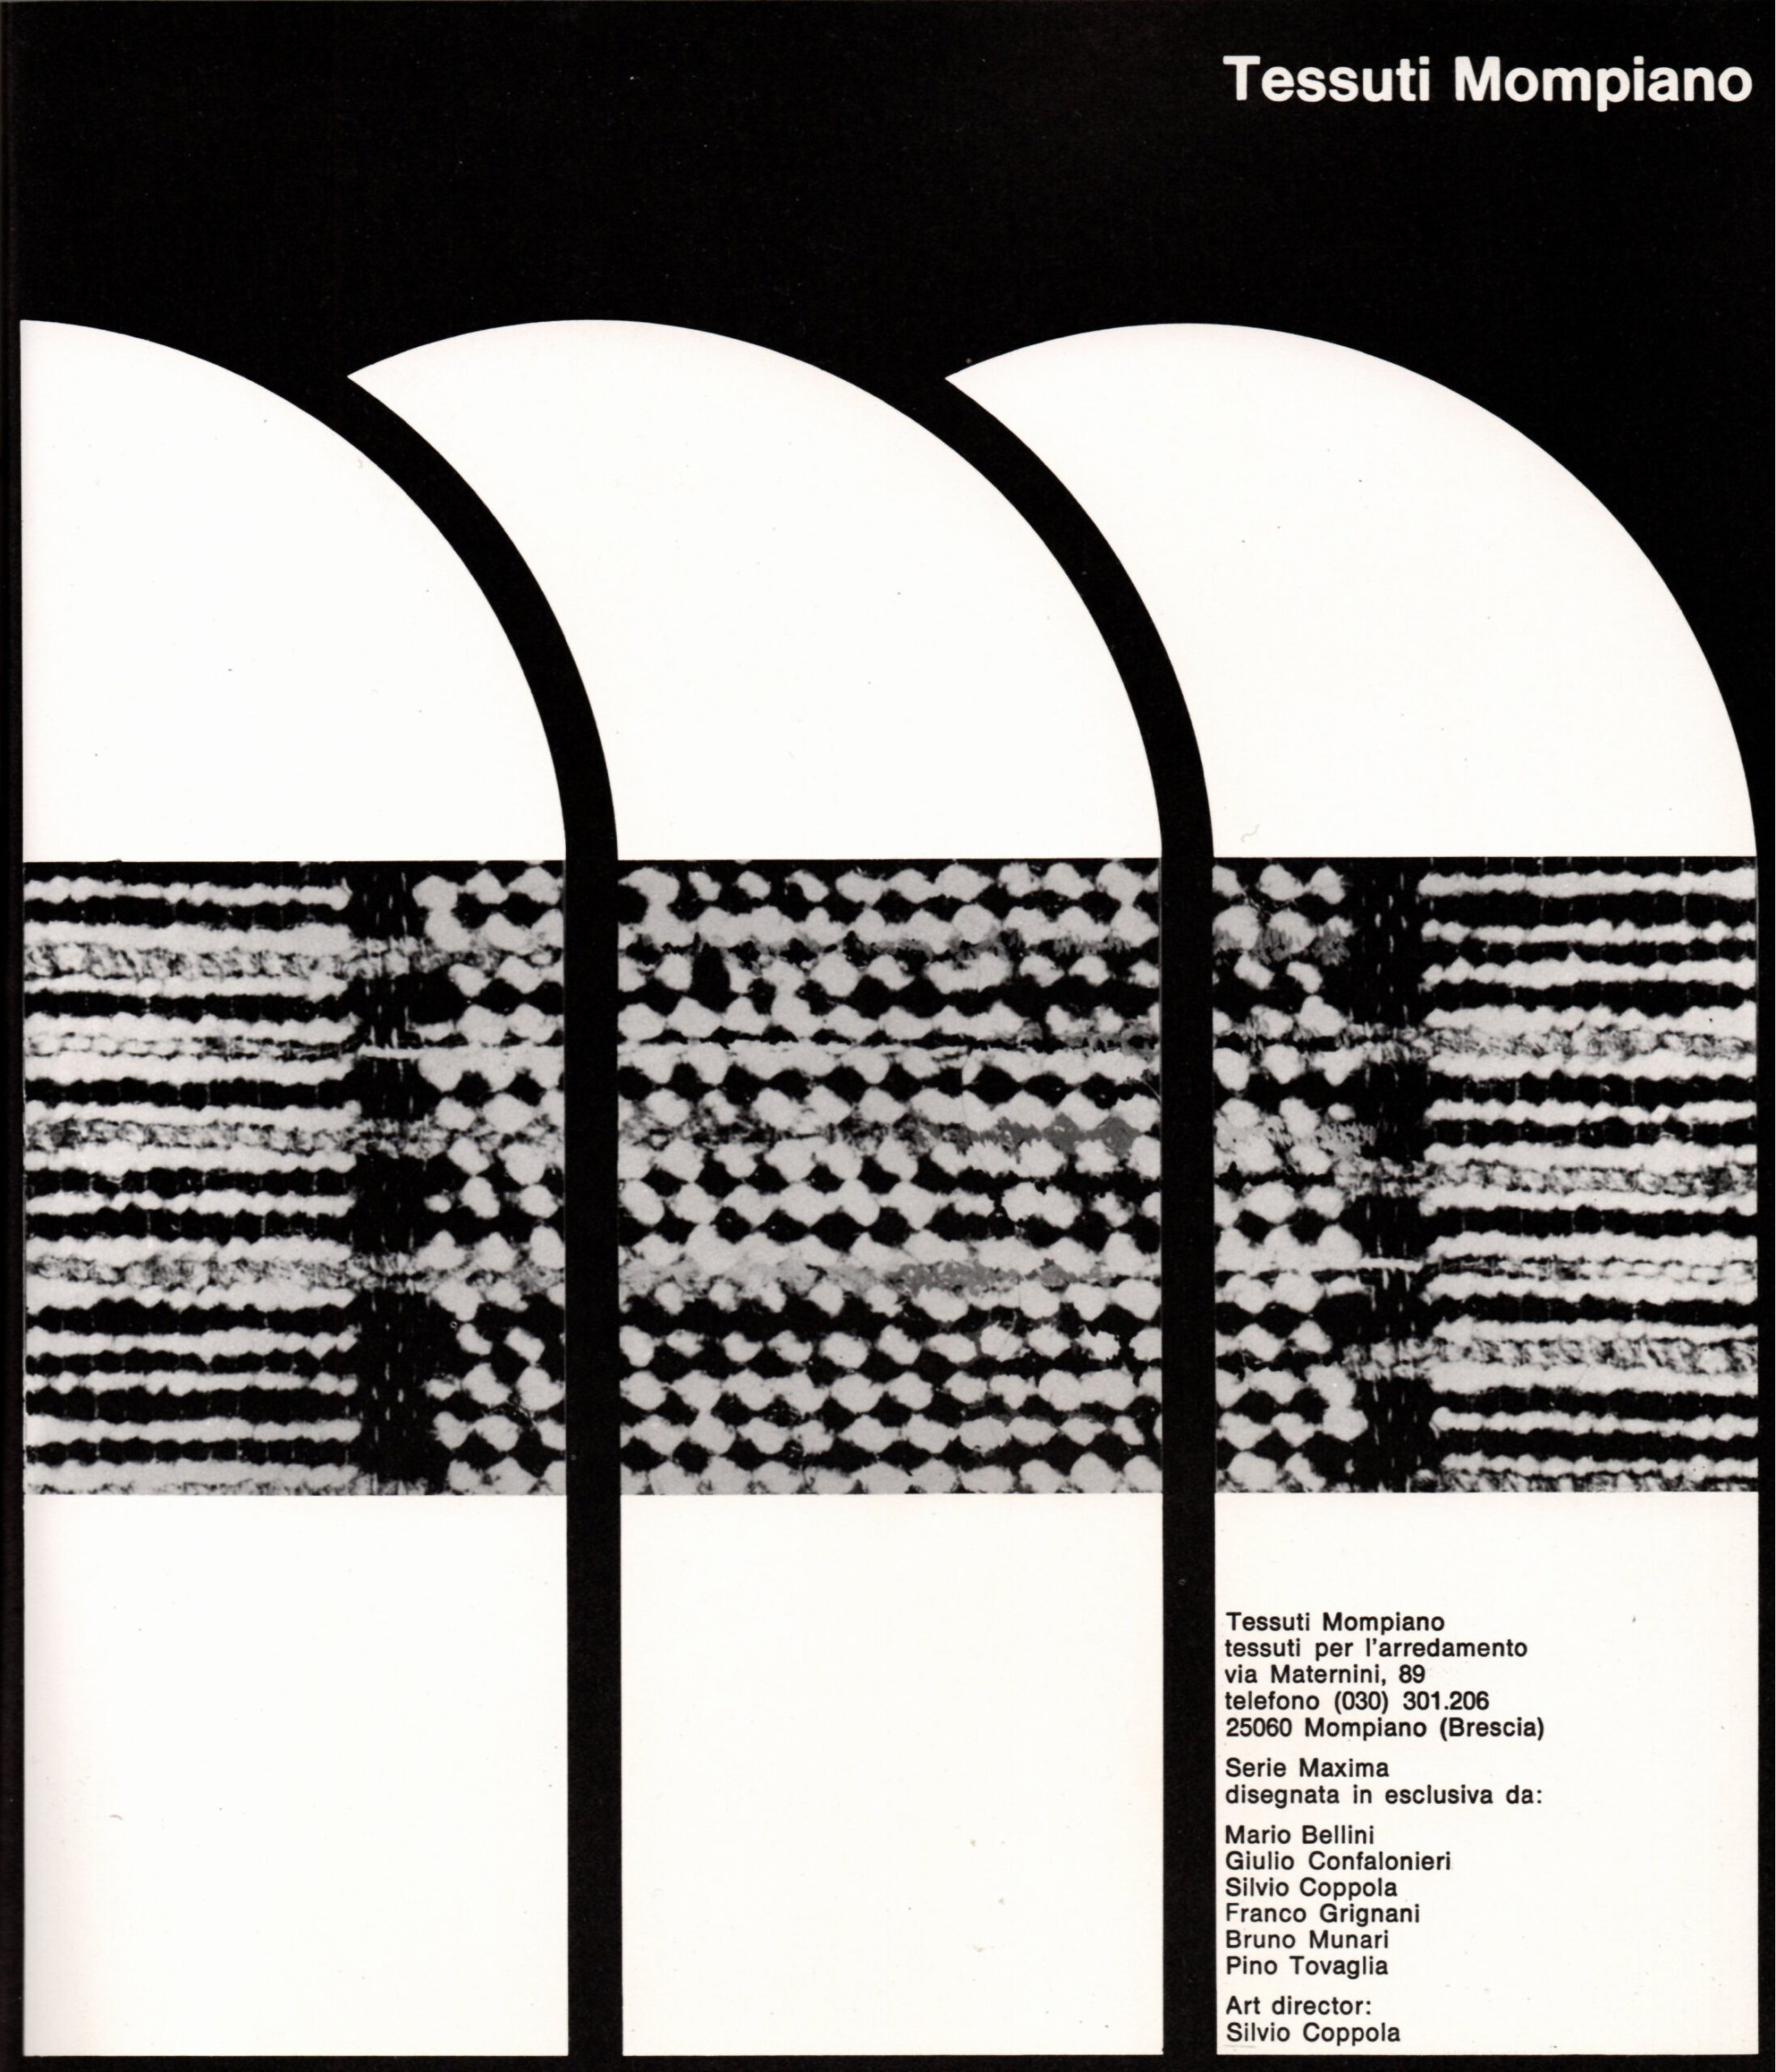 ED Group for Tessuti Mompiano, 1973